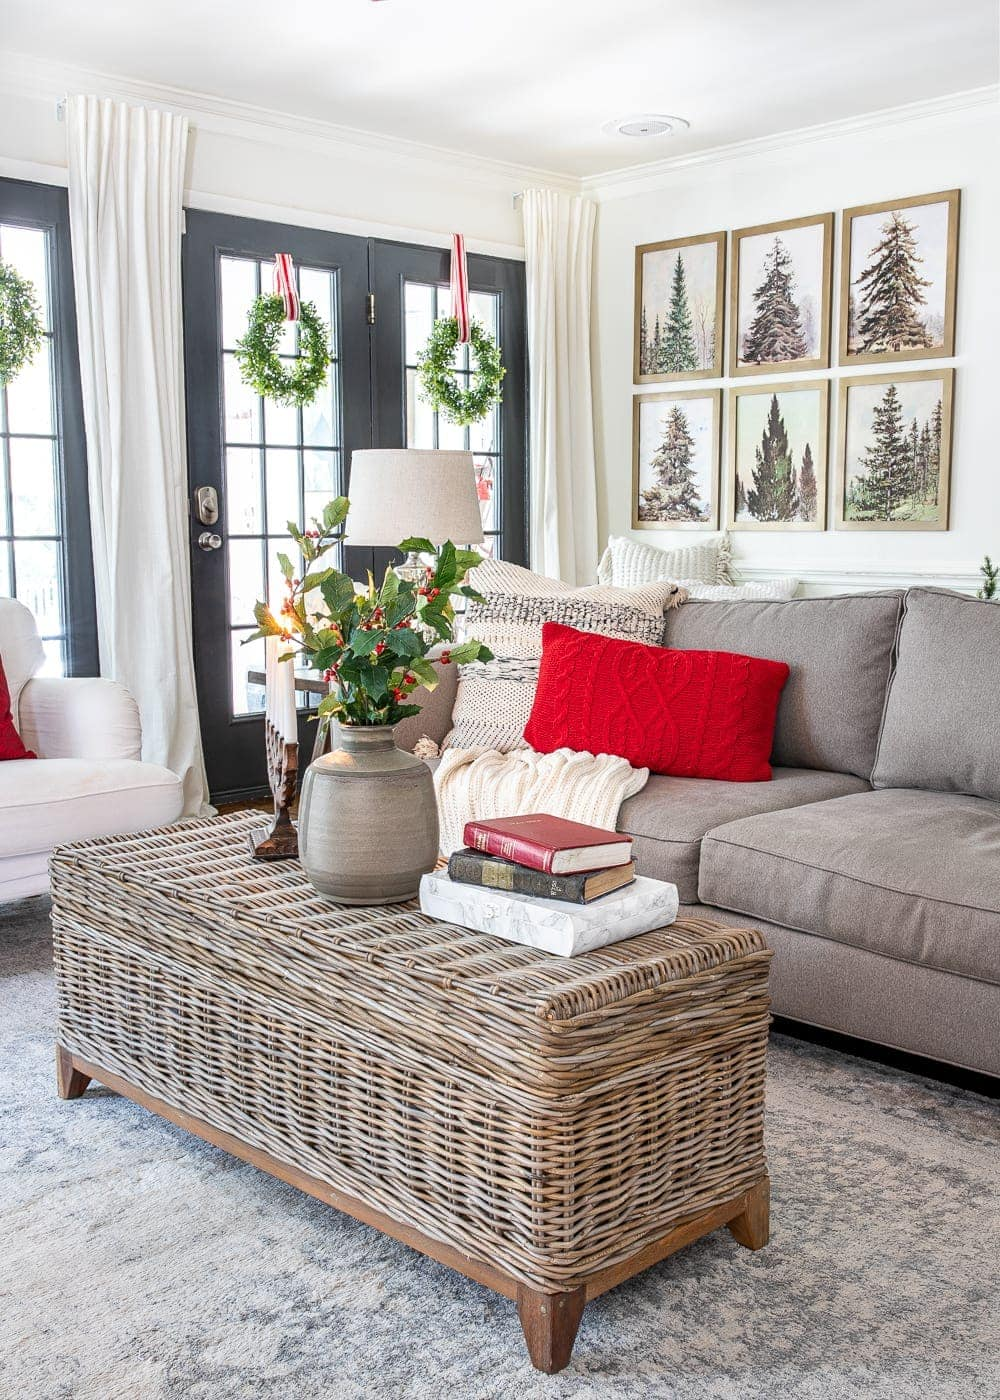 Christmas decor ideas | modern cozy Christmas living room